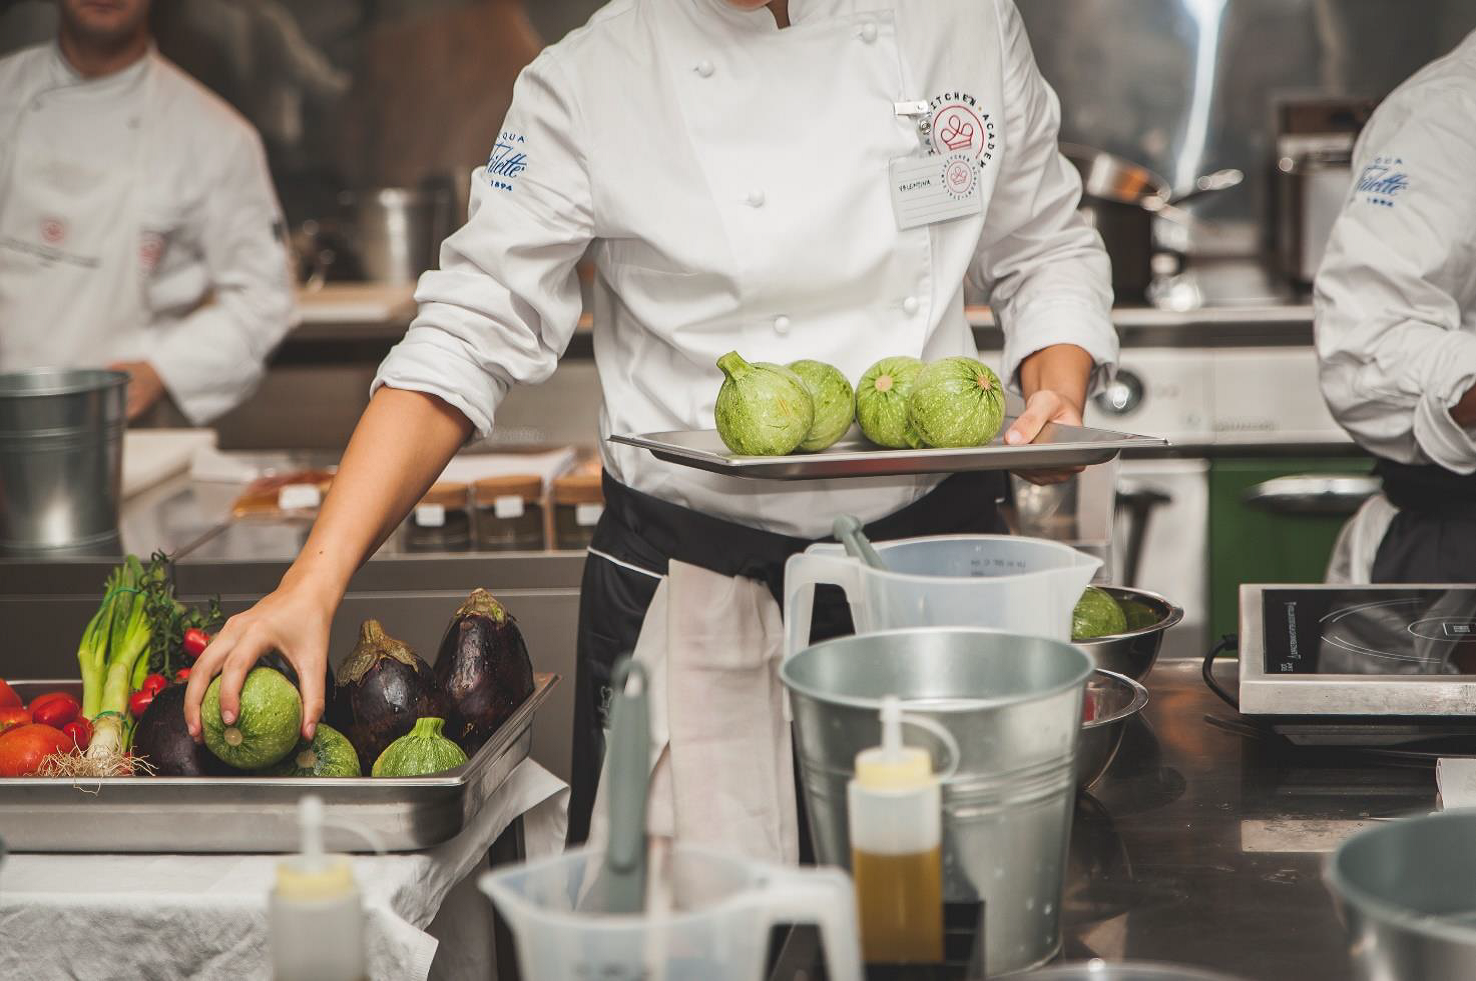 Corso di cucina base 30 10 2017 italian kitchen academyitalian kitchen academy - Corso base di cucina ...